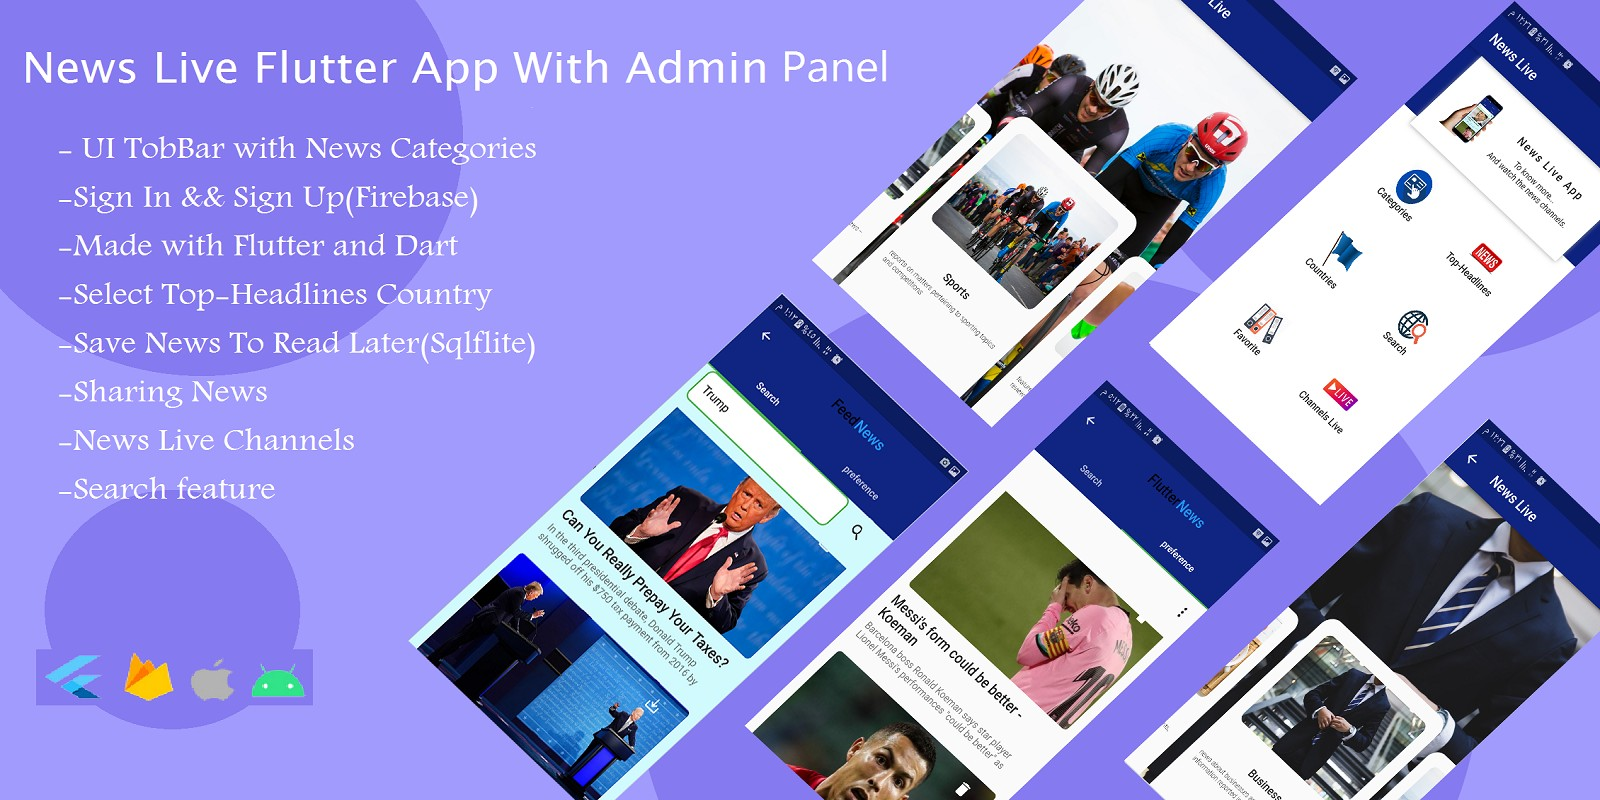 News Live Flutter App With Admin Panel